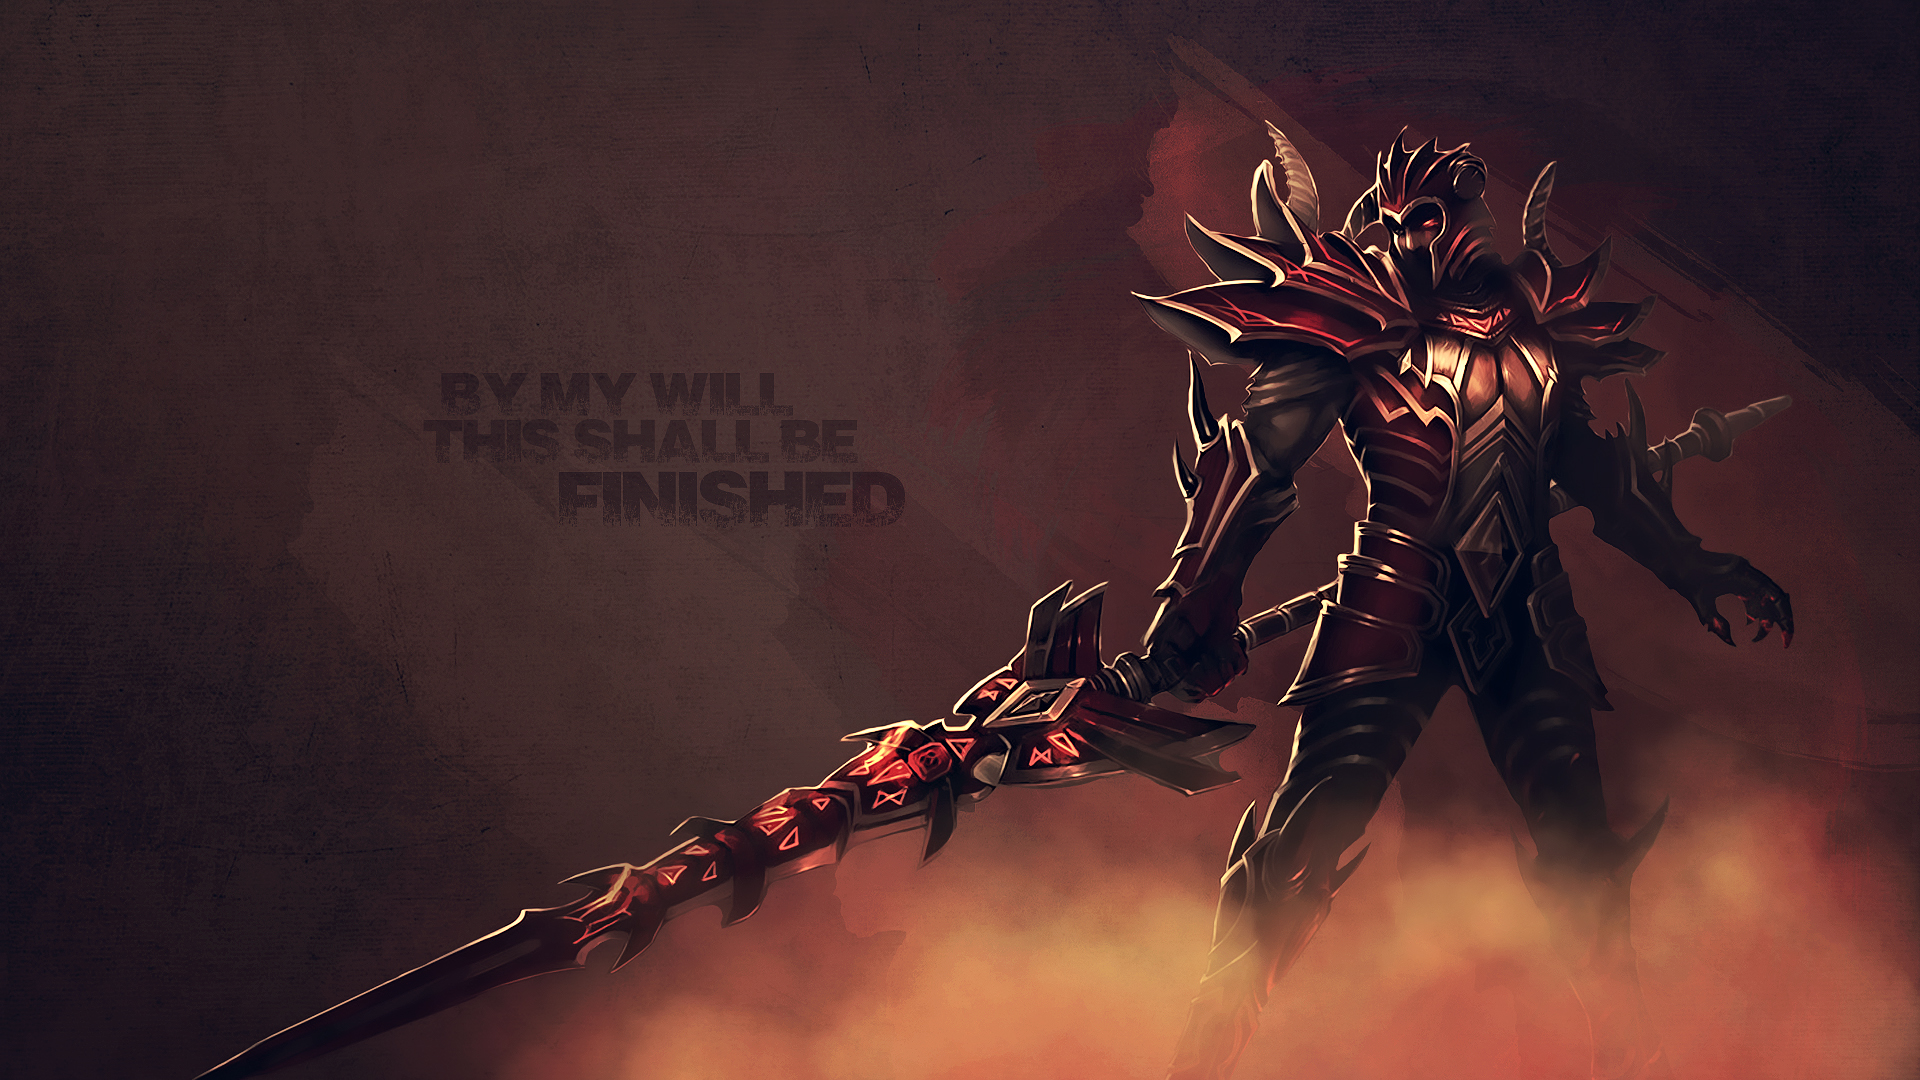 DragonSlayer Jarvan Fan Art - League of Legends Wallpapers